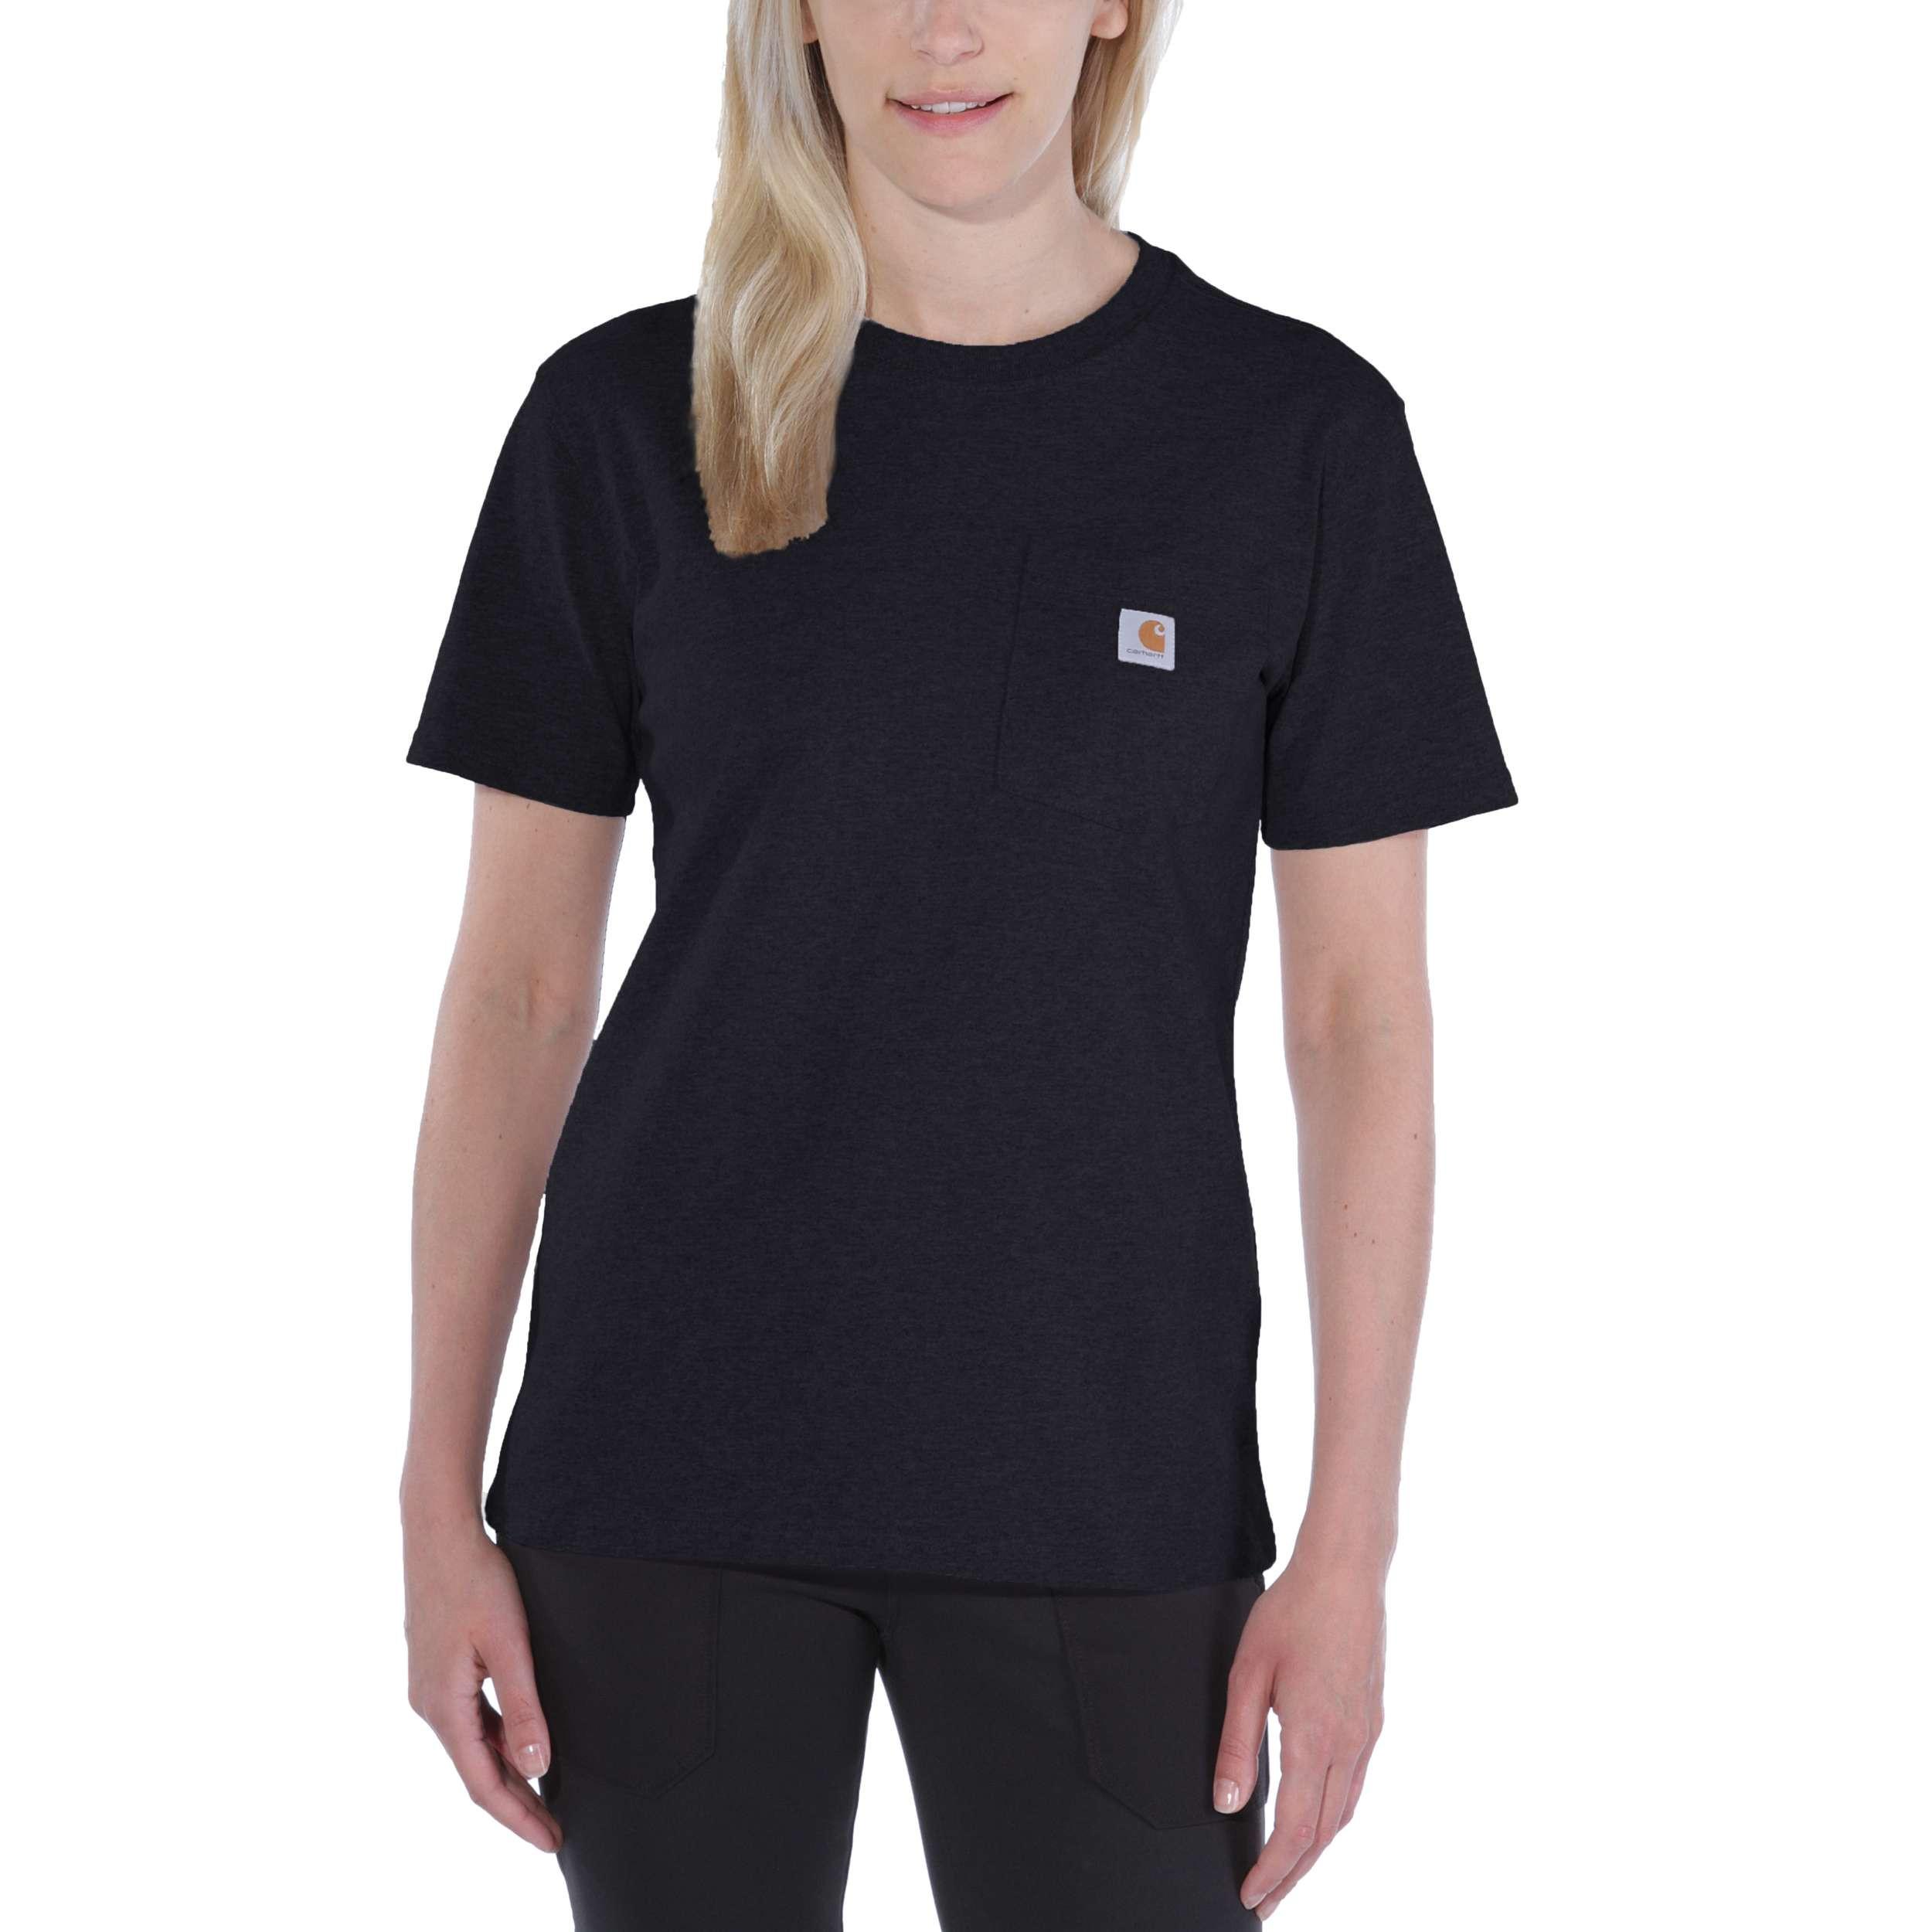 Футболка женская Carhartt WK87 Workwear Pocket T-Shirt - 103067 (Black)